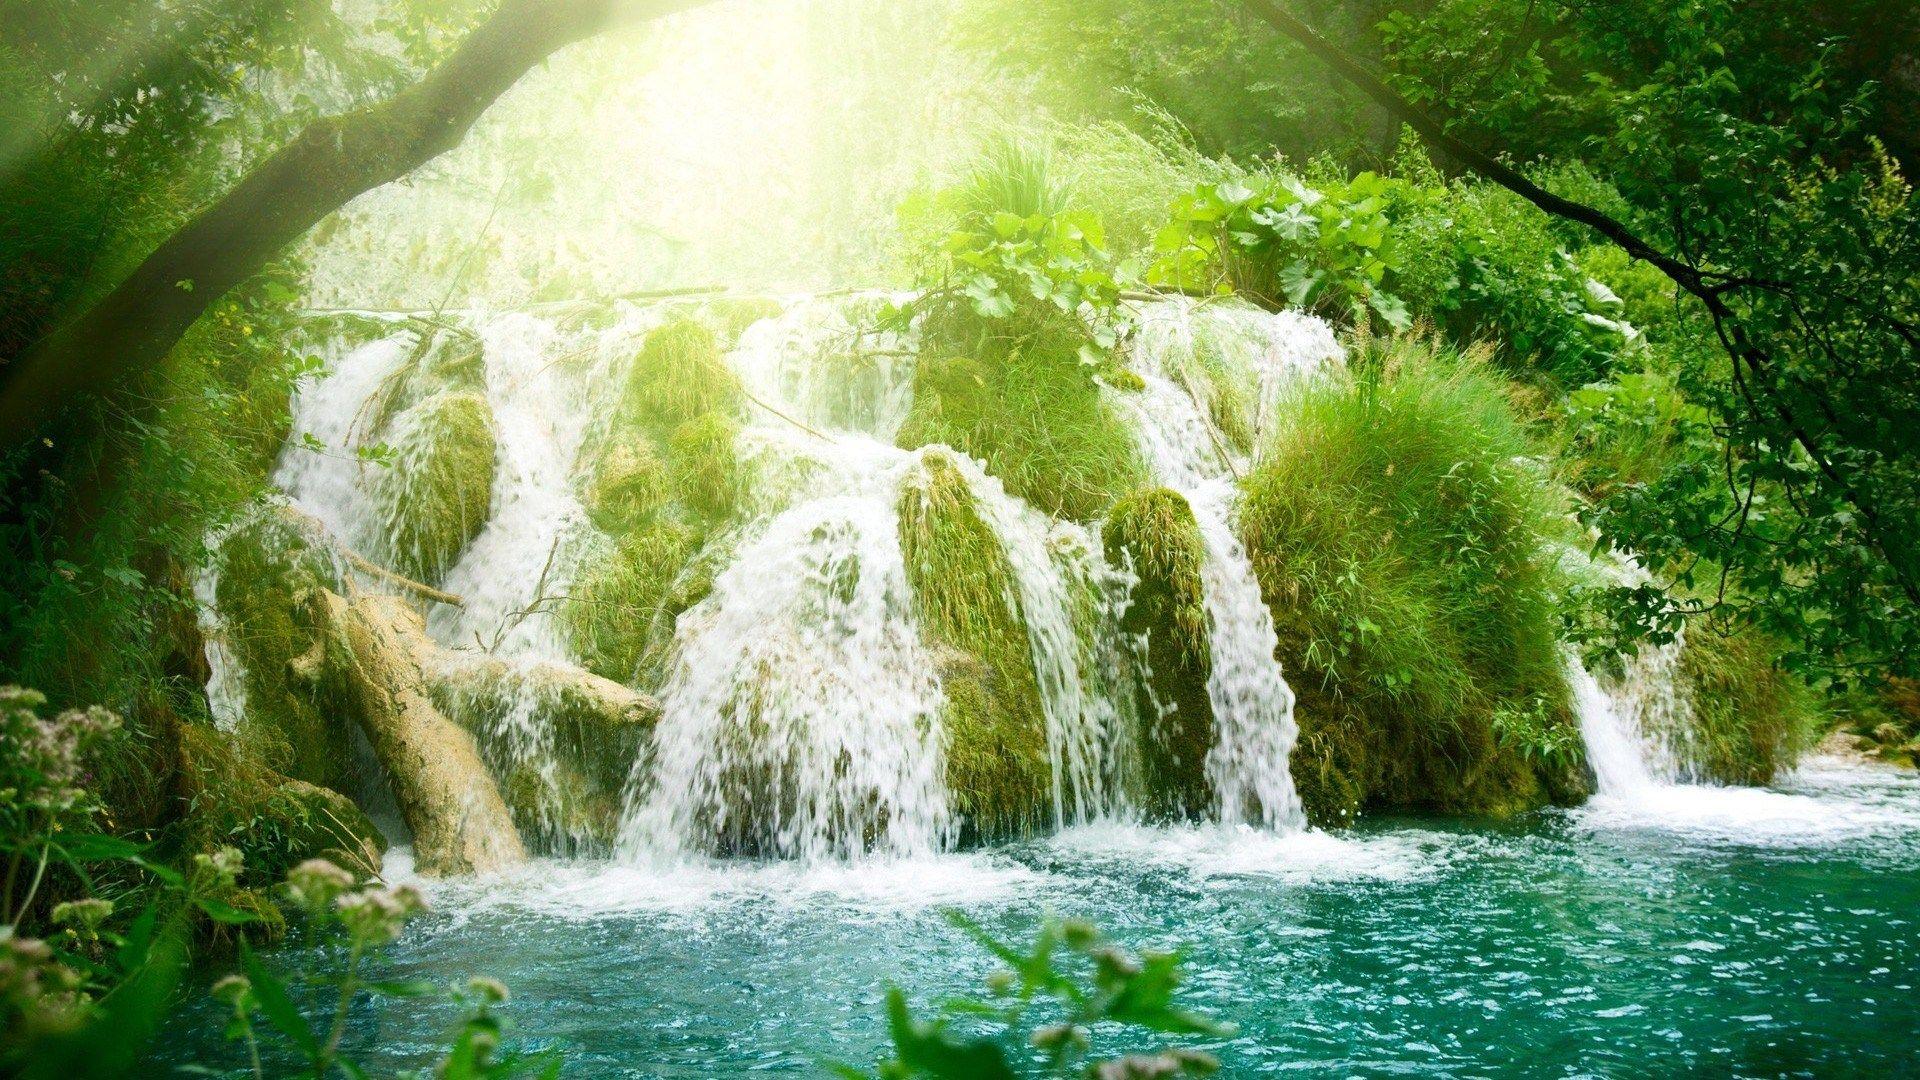 Waterfall Wallpaper Paradise Download